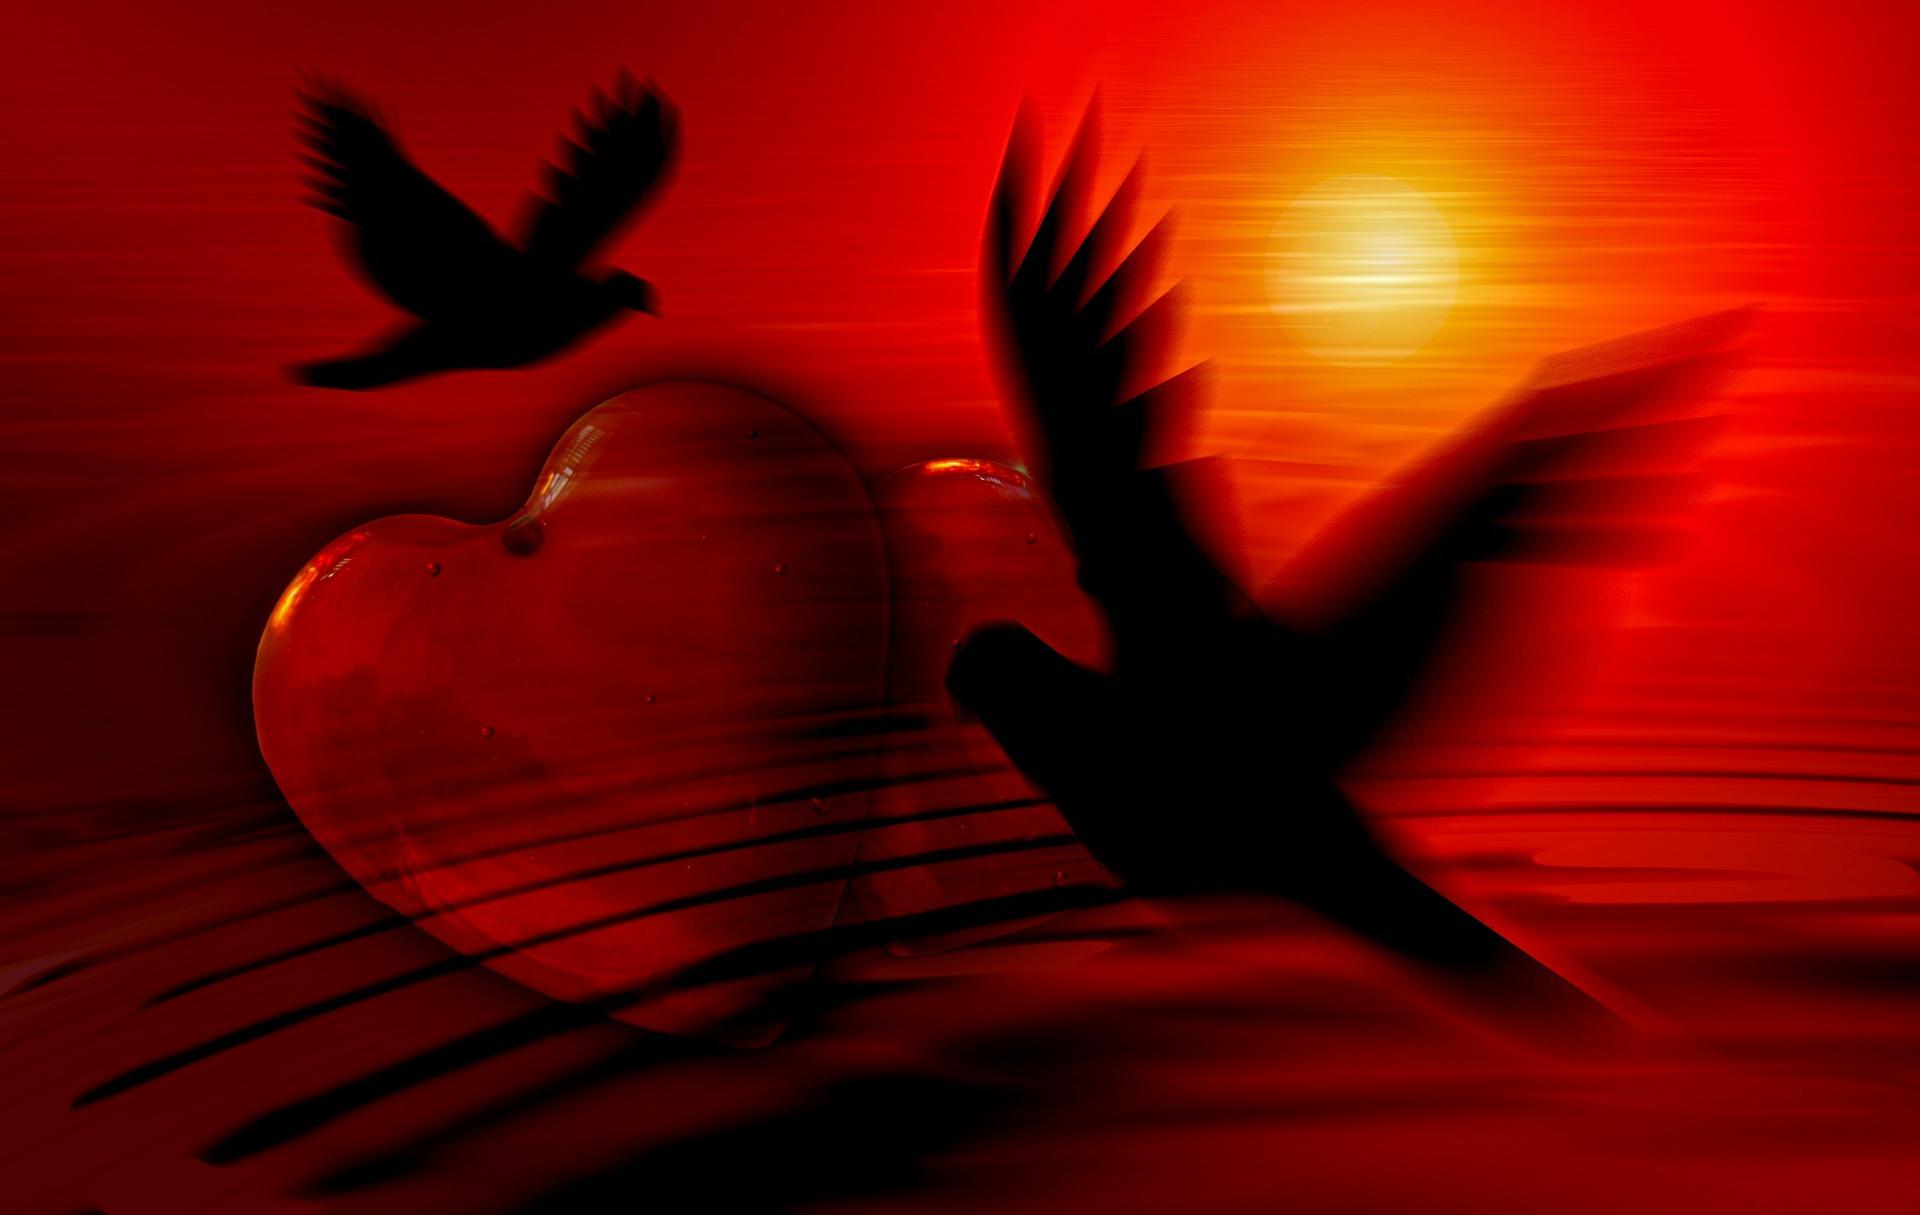 Гортензия, картинки сердце голуби